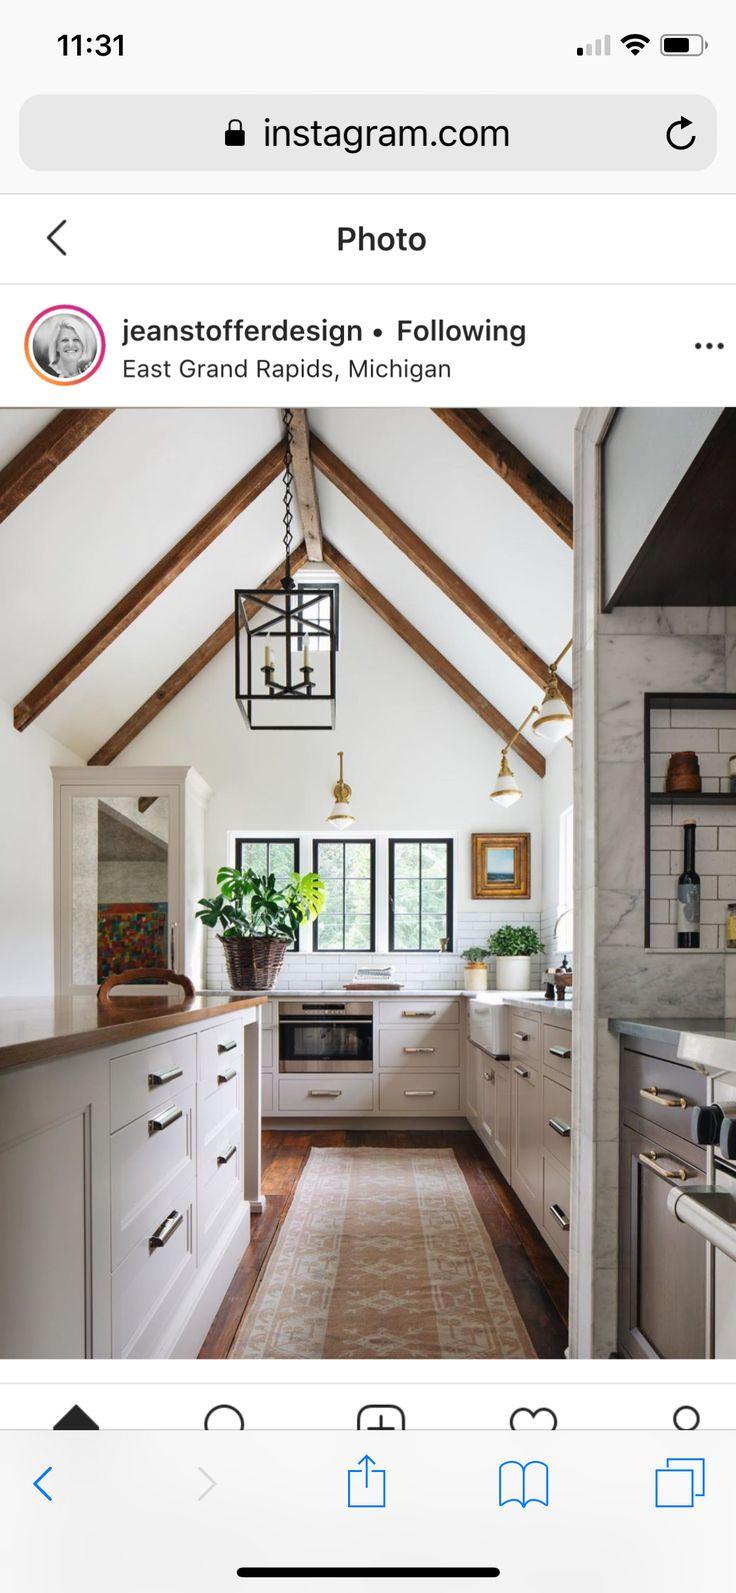 Pin by Patty Brooks on Kitchen favs | Kitchen cabinets ...